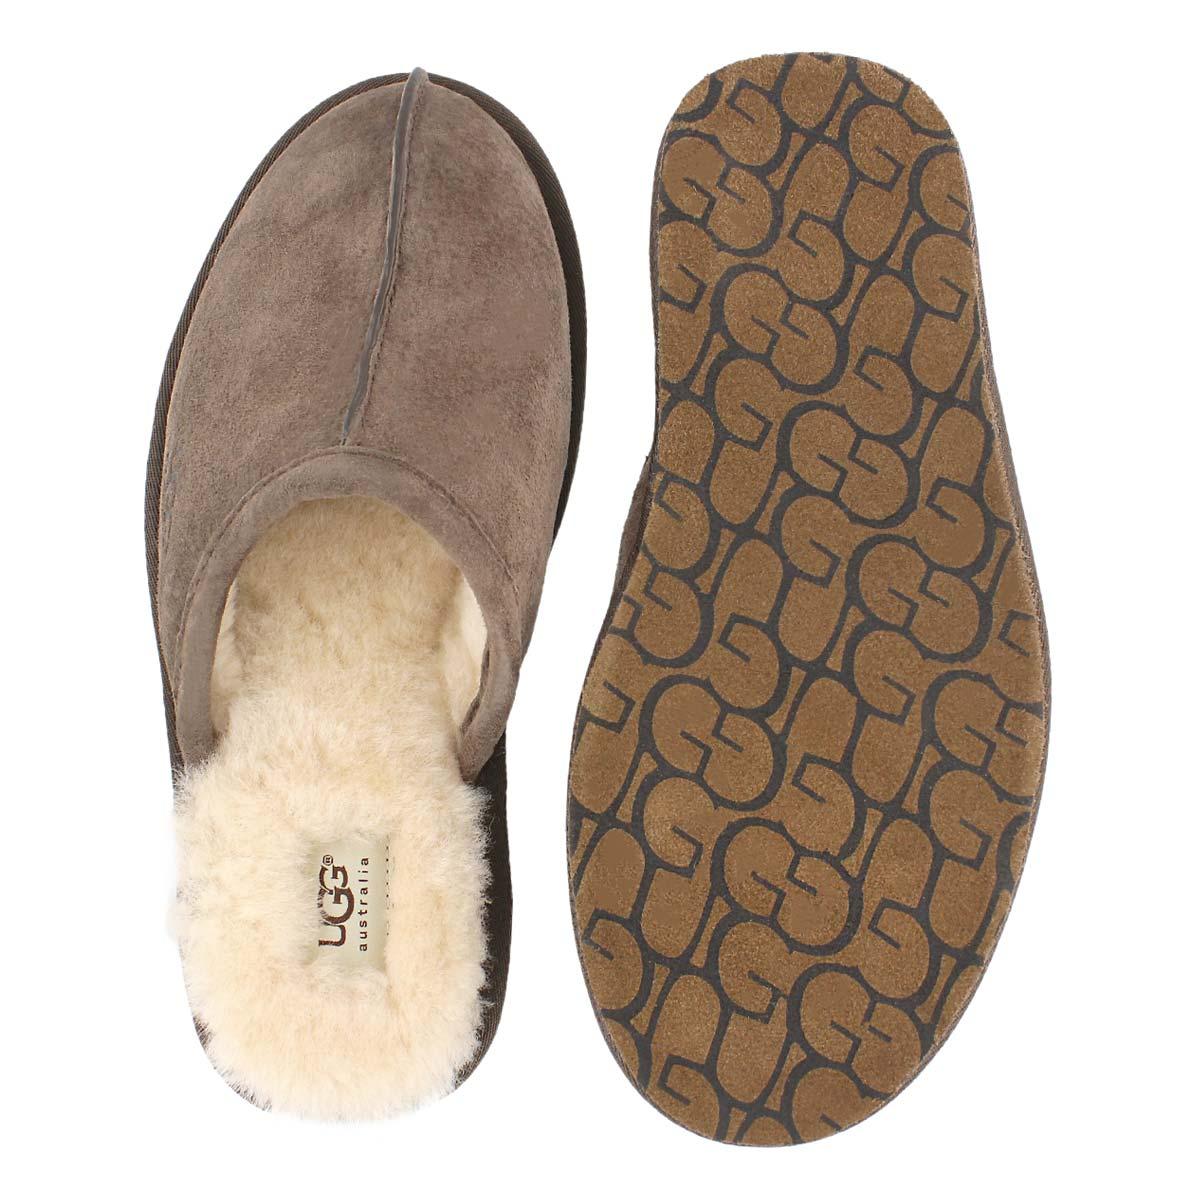 Mns Scuff espresso sheepskin slipper